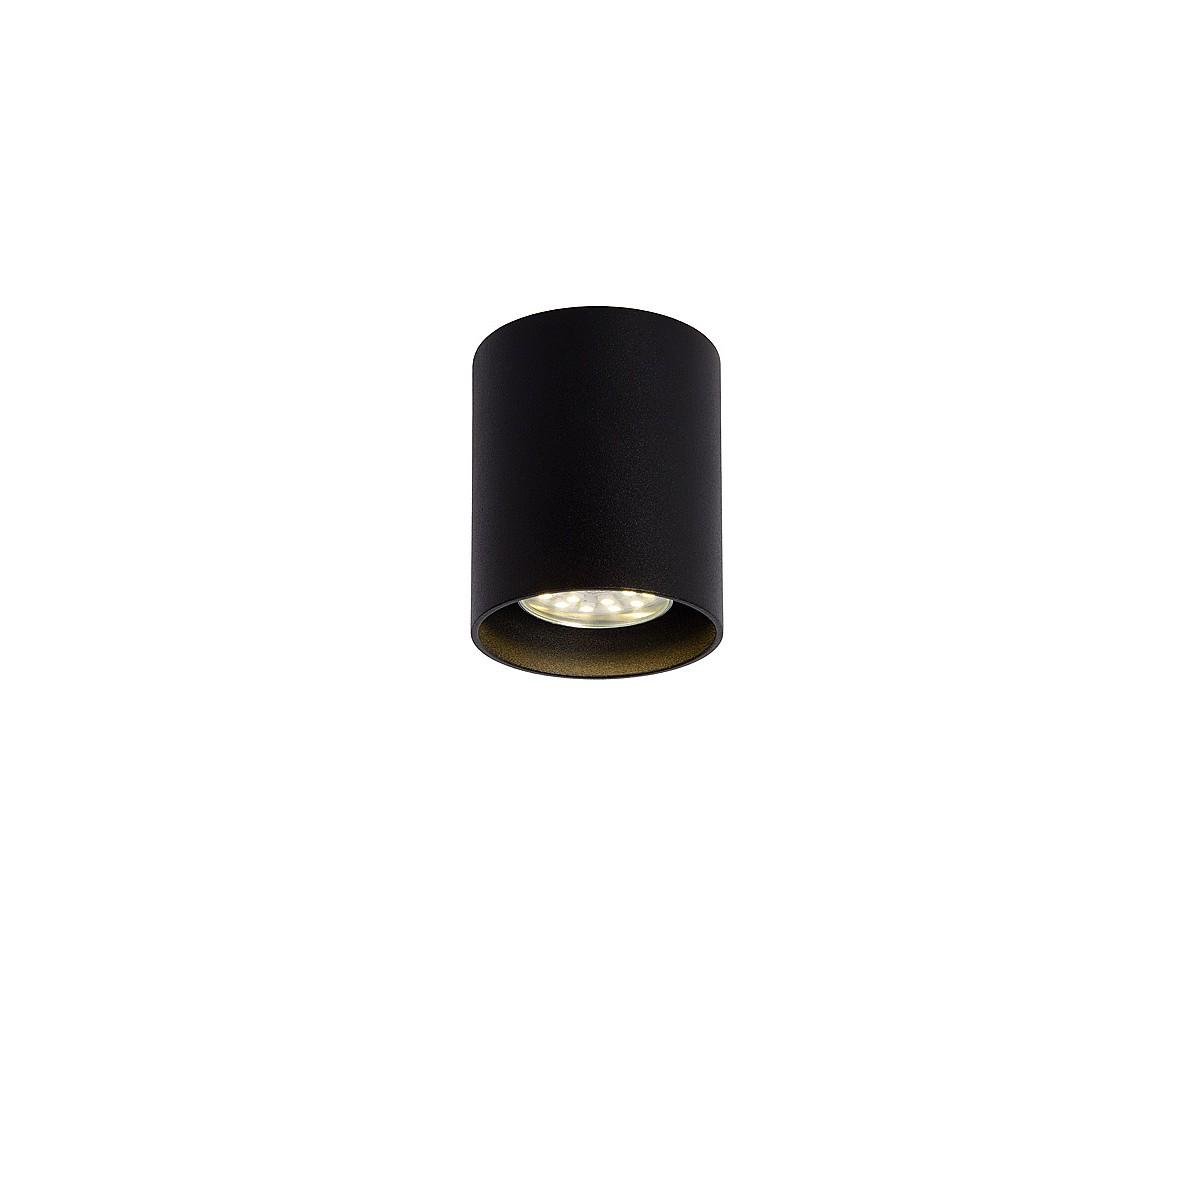 Lucide BODI Round GU10 excl D8 H9.5cm Czarny 09100/01/30 Plafon